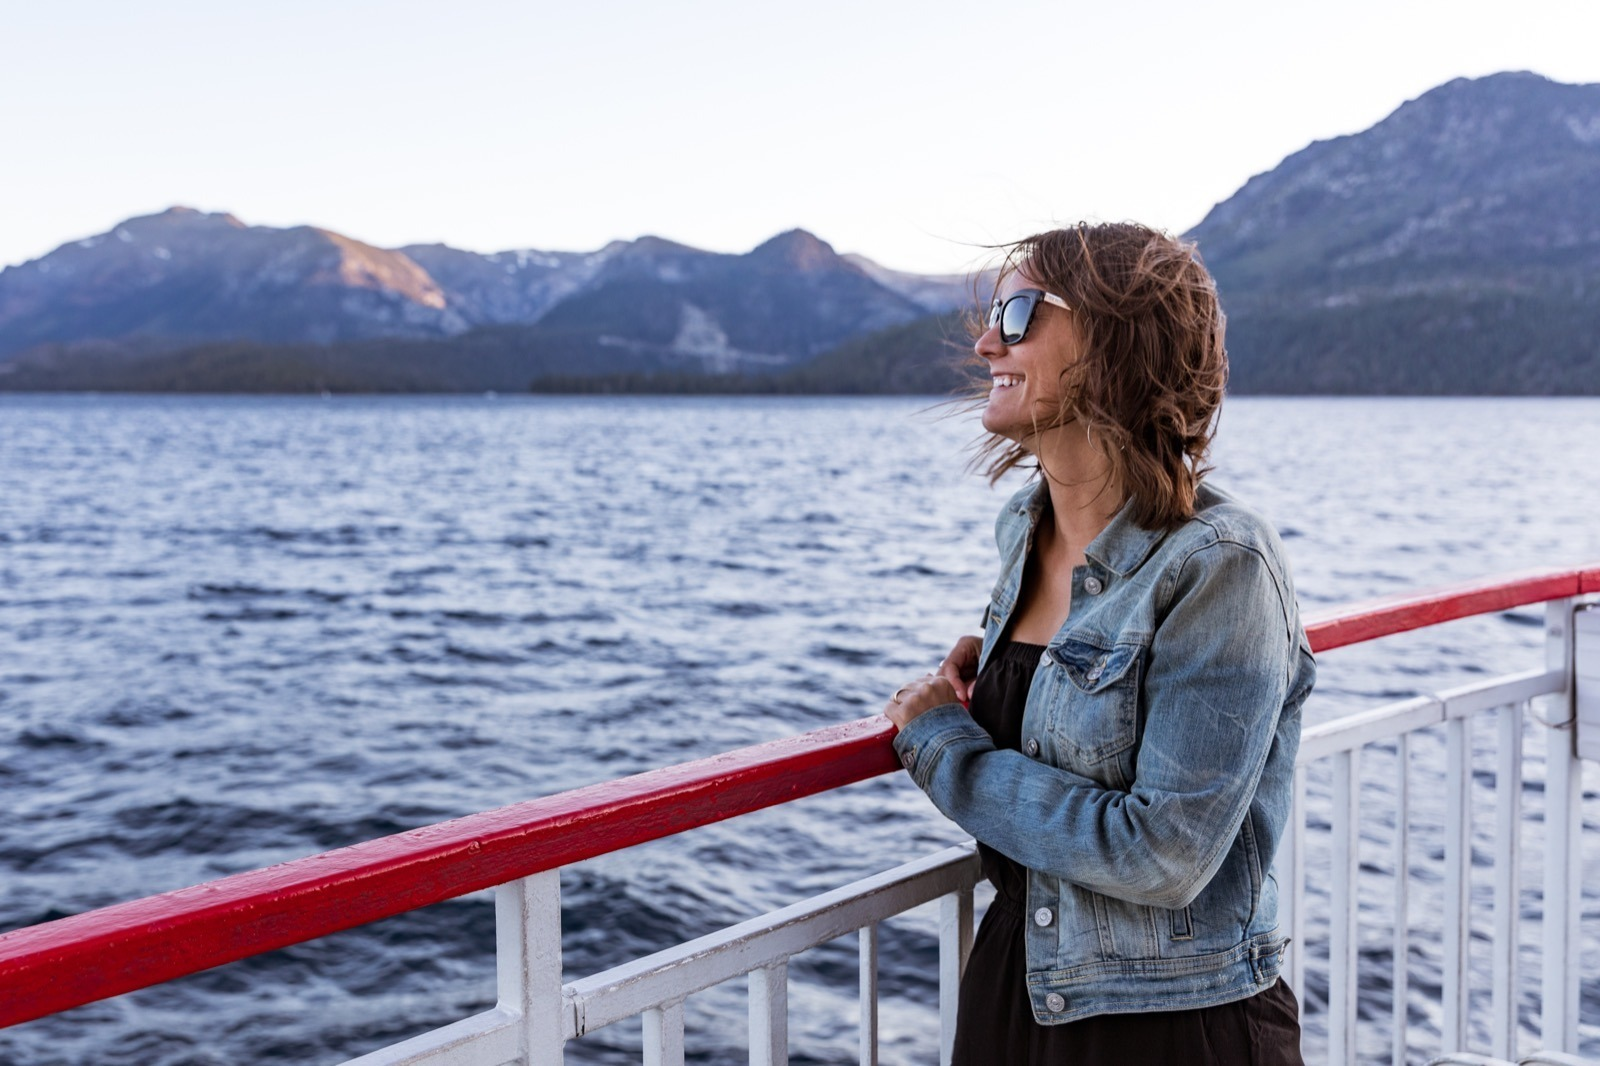 california-high-sierra-south-lake-tahoe-zephyr-cove-sunset-cruise-3